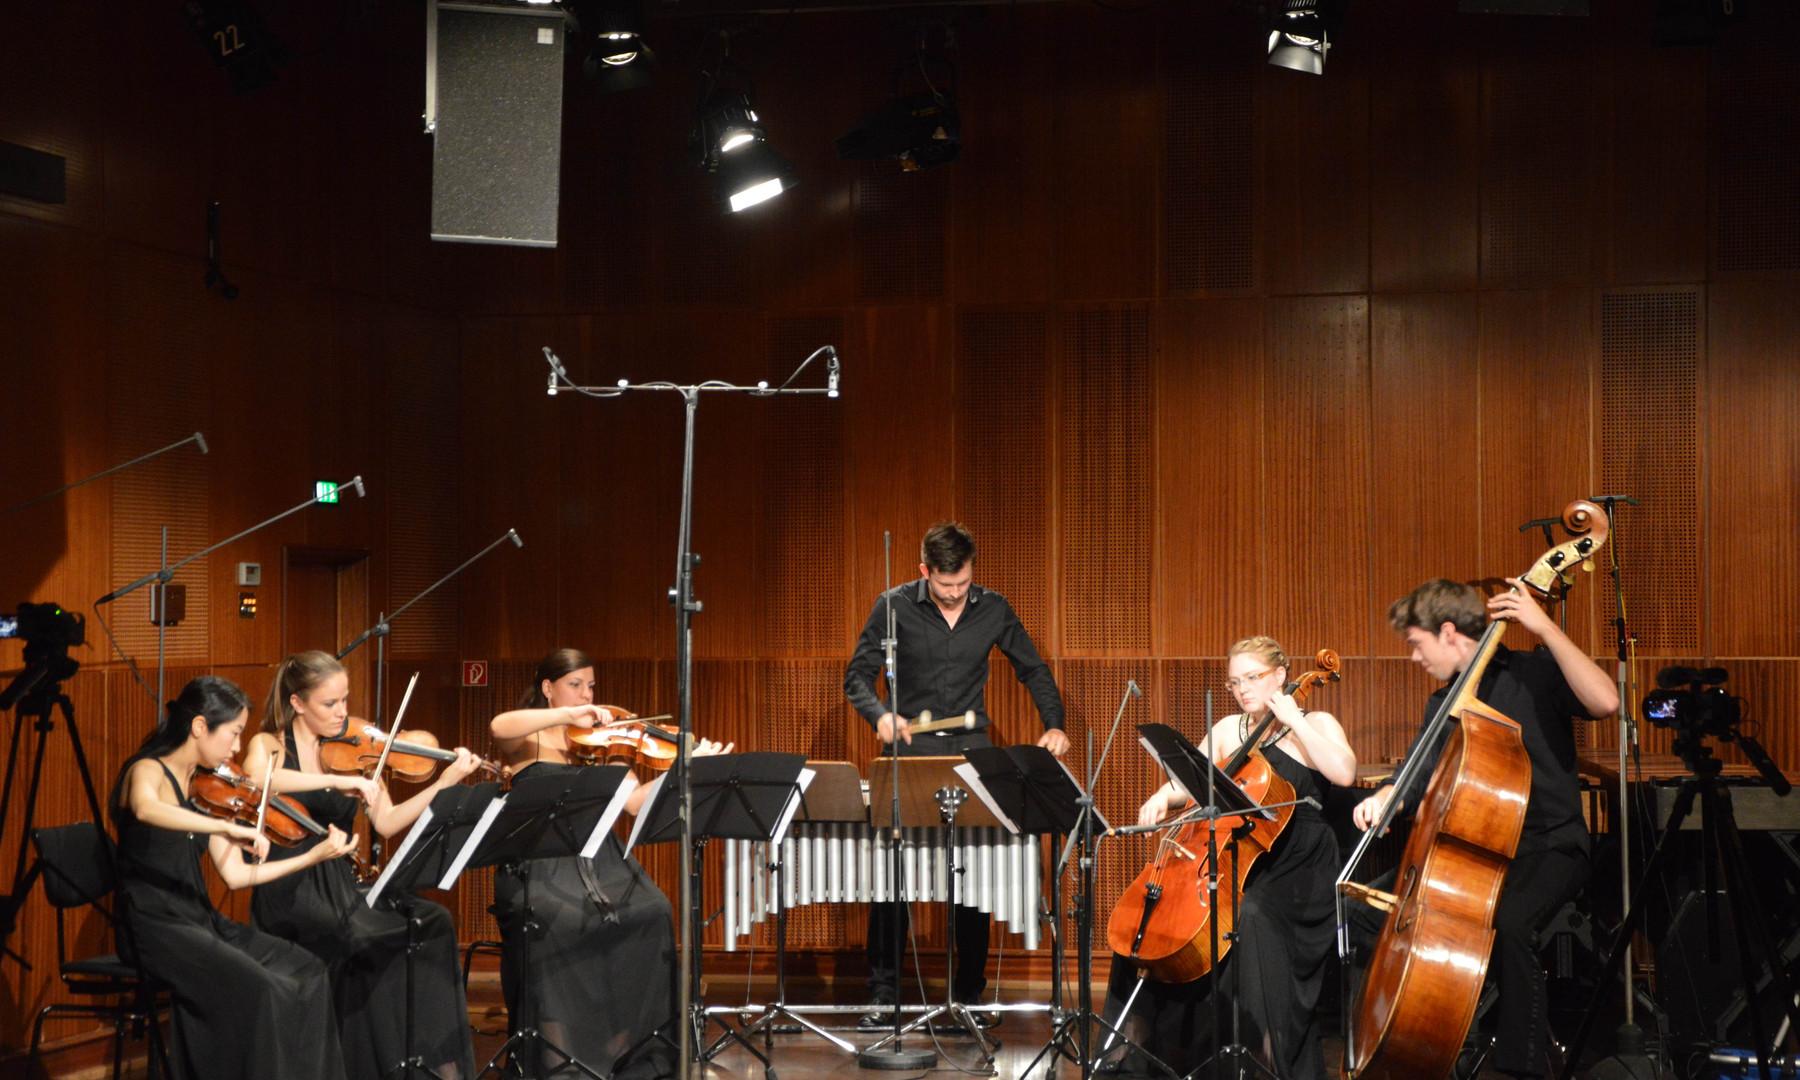 Kammerkonzert im WDR Funkhaus 15.6.2016